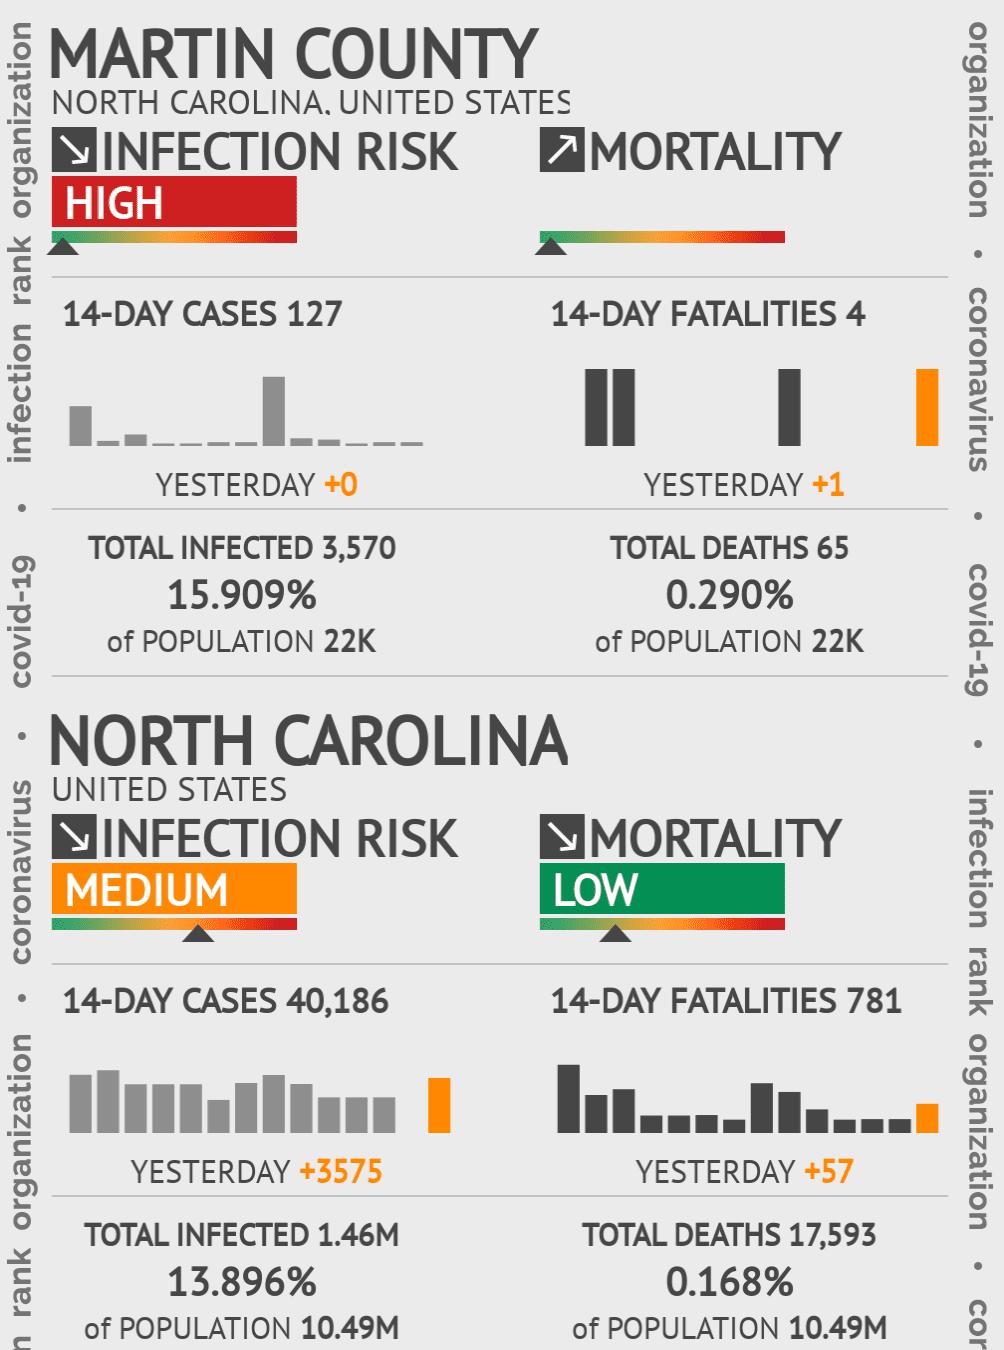 Martin County Coronavirus Covid-19 Risk of Infection on February 28, 2021